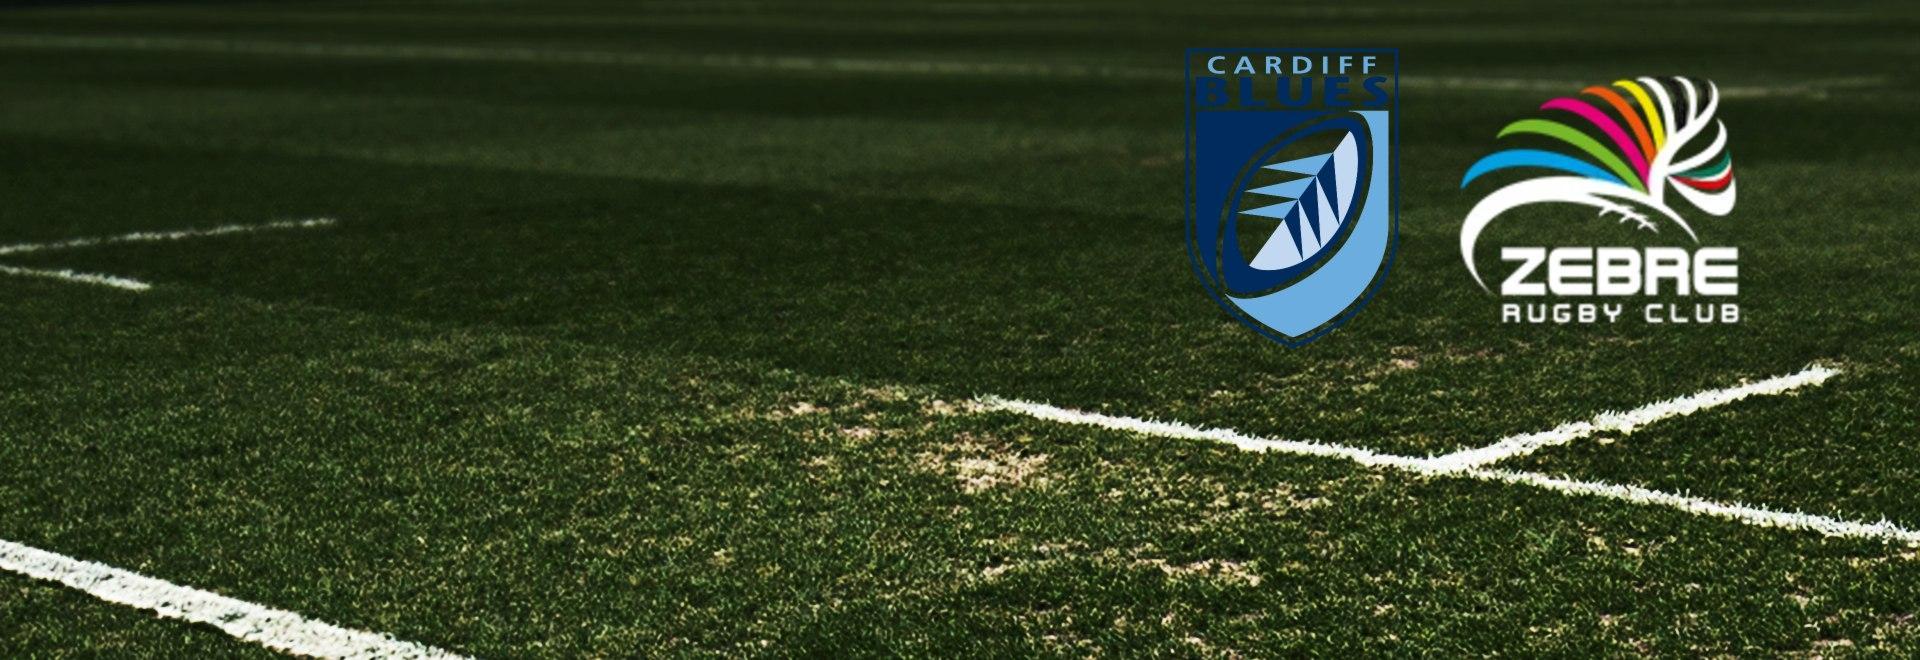 Cardiff Blues - Zebre